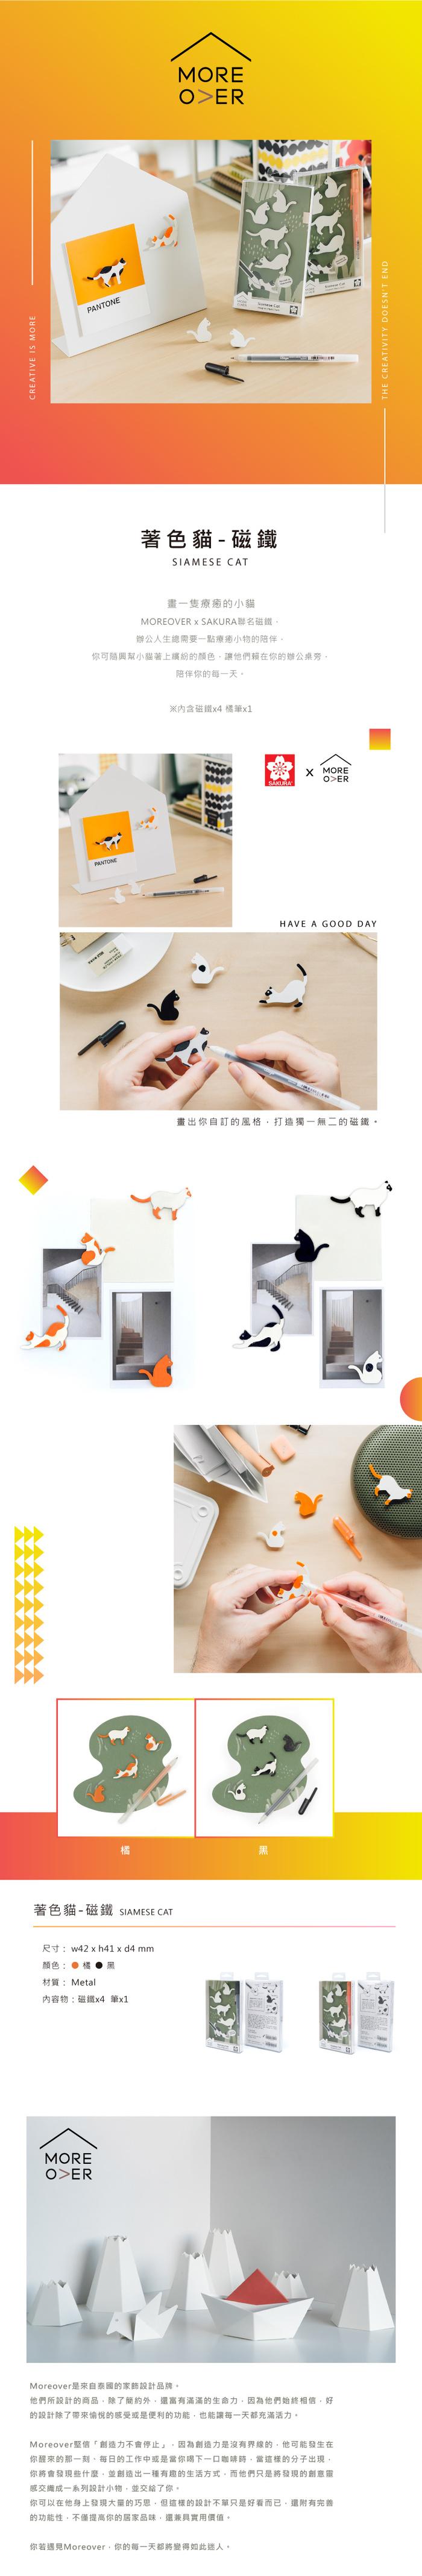 (複製)Moreover|秘密閣樓-飾品收納盒